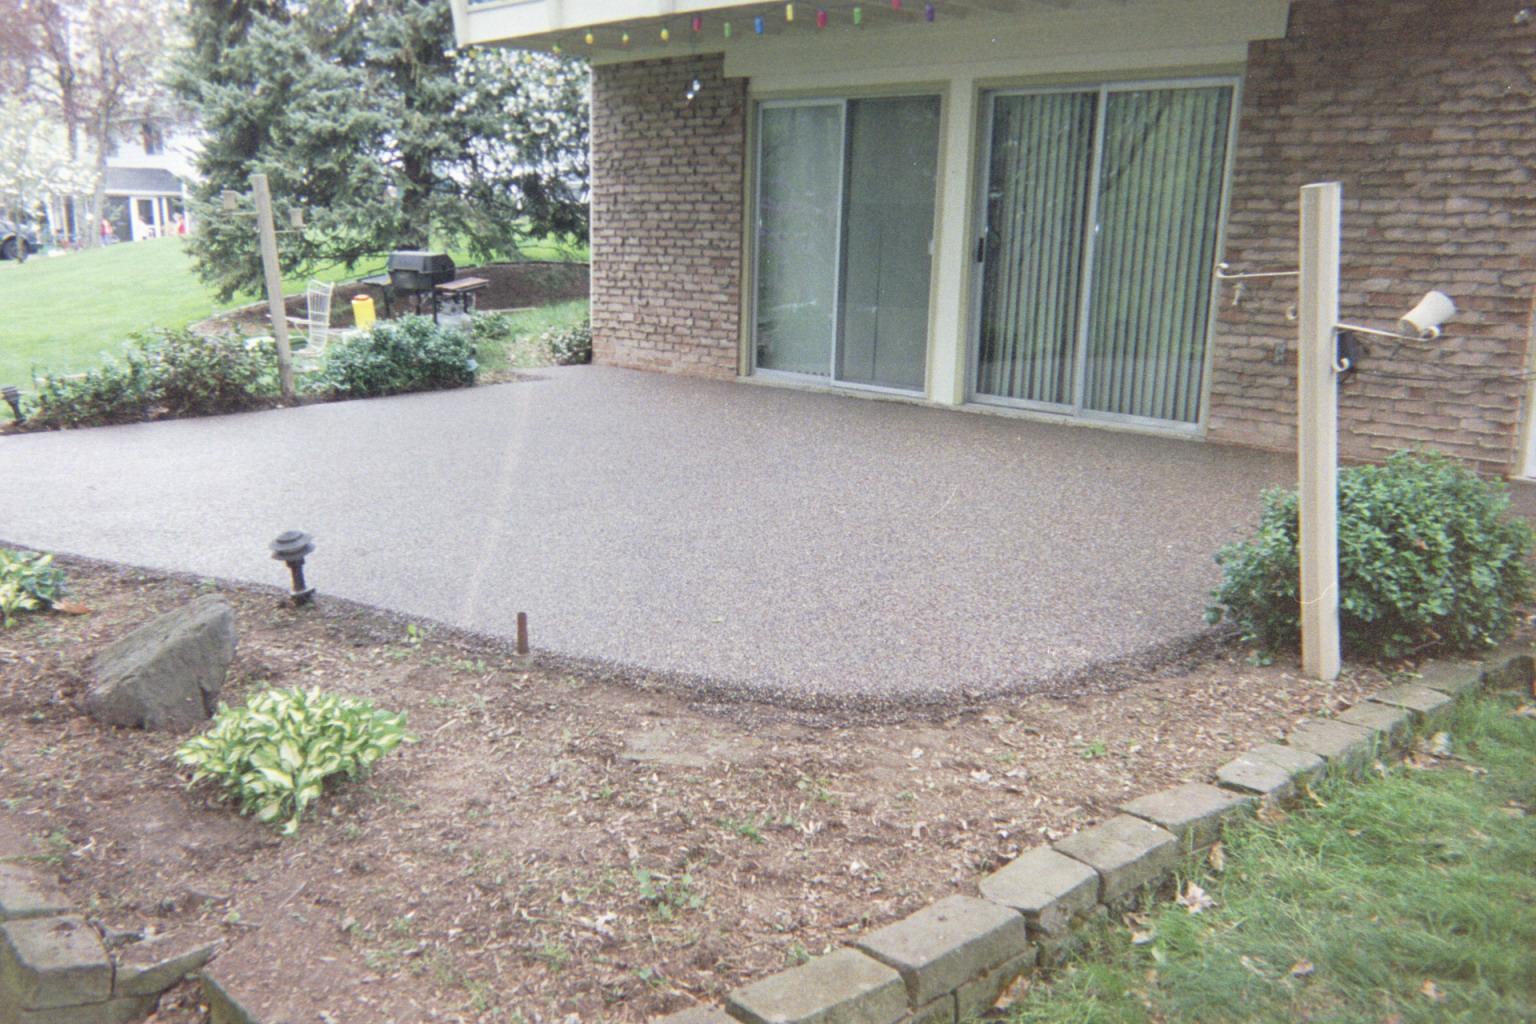 Clear Coat Cement : Clear coat for concrete floors